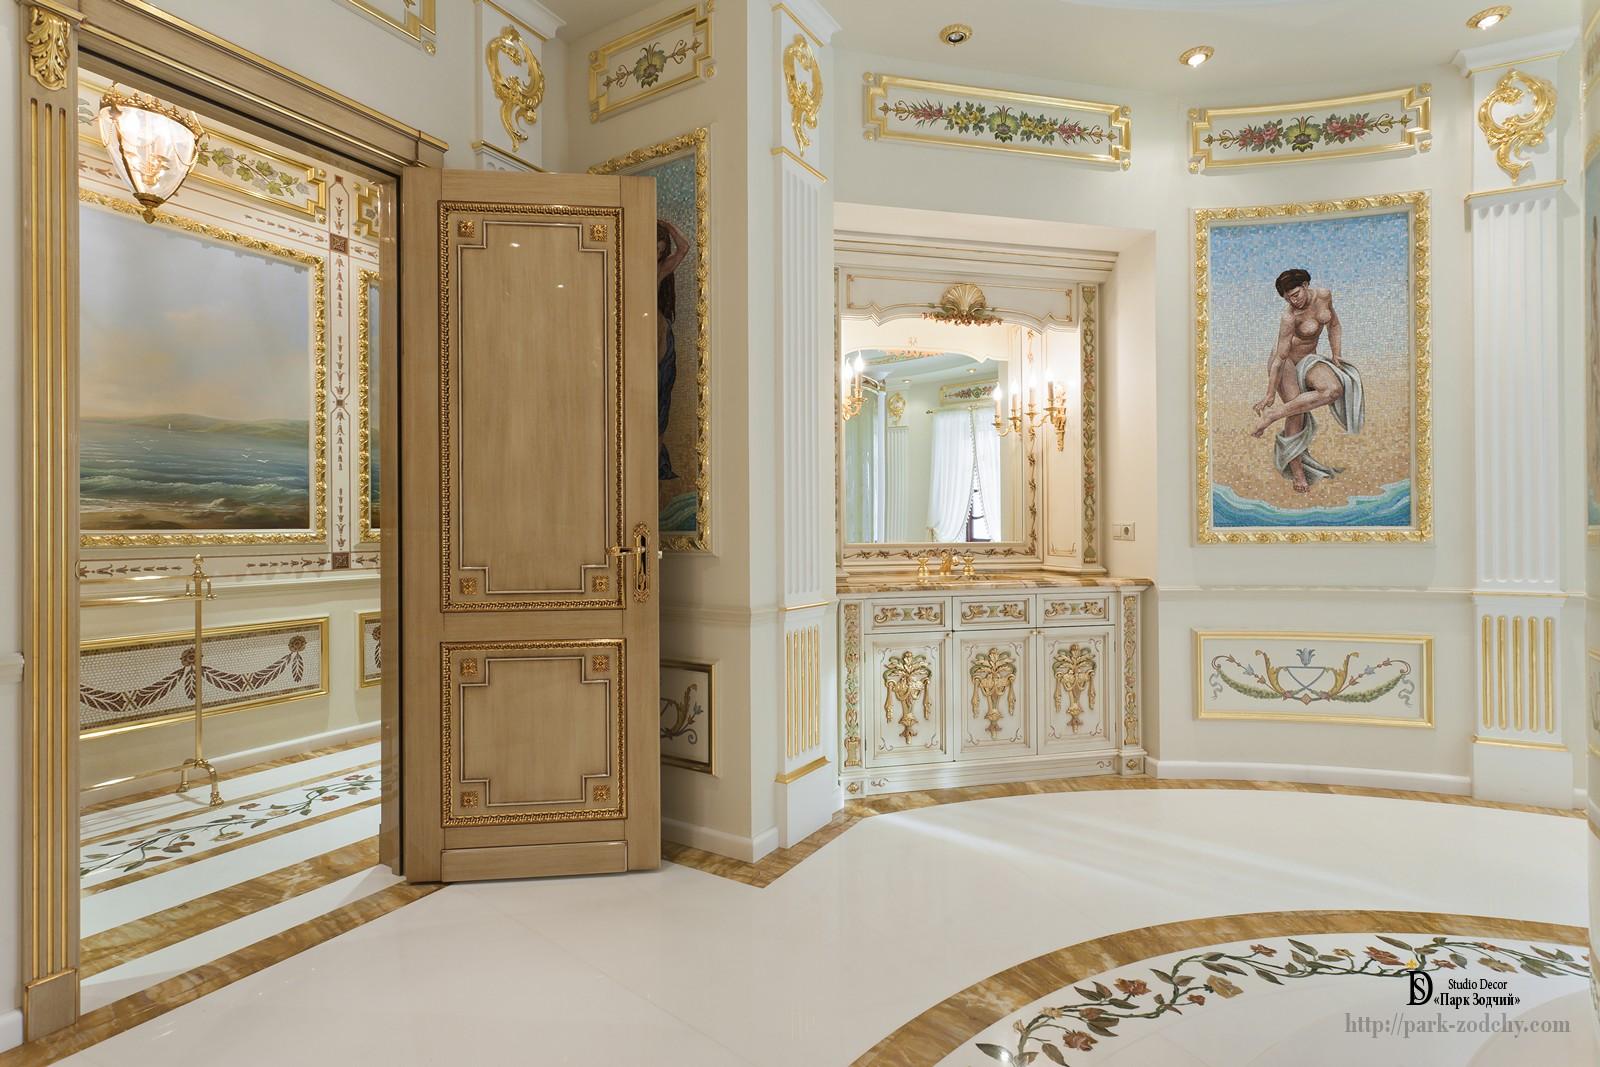 Богато декорированная ванная комната